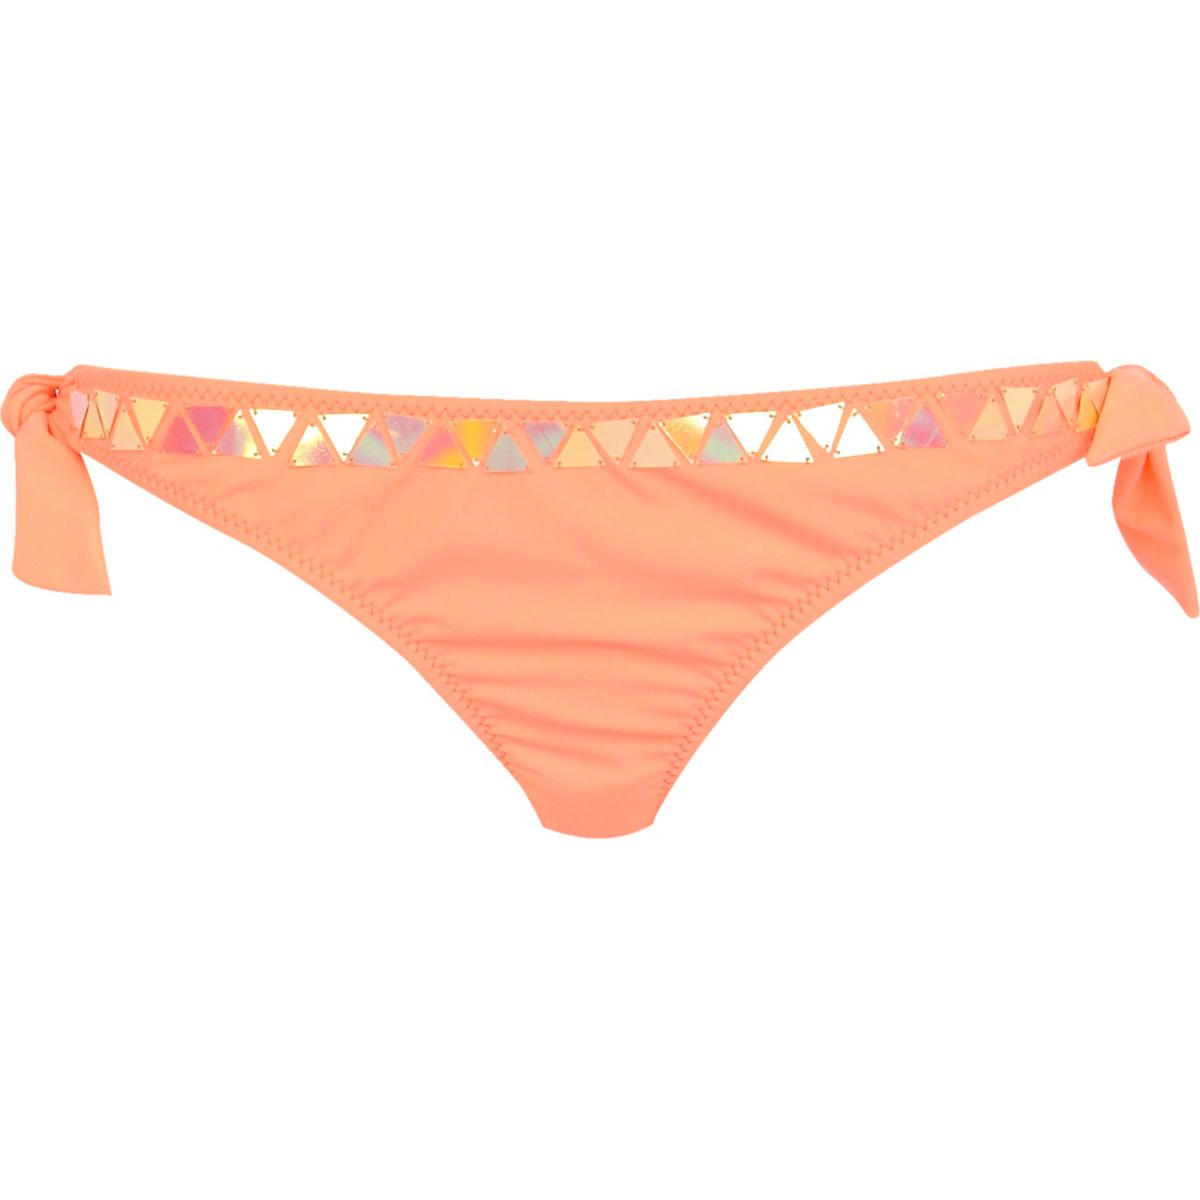 Coral embellished tie up bikini bottoms